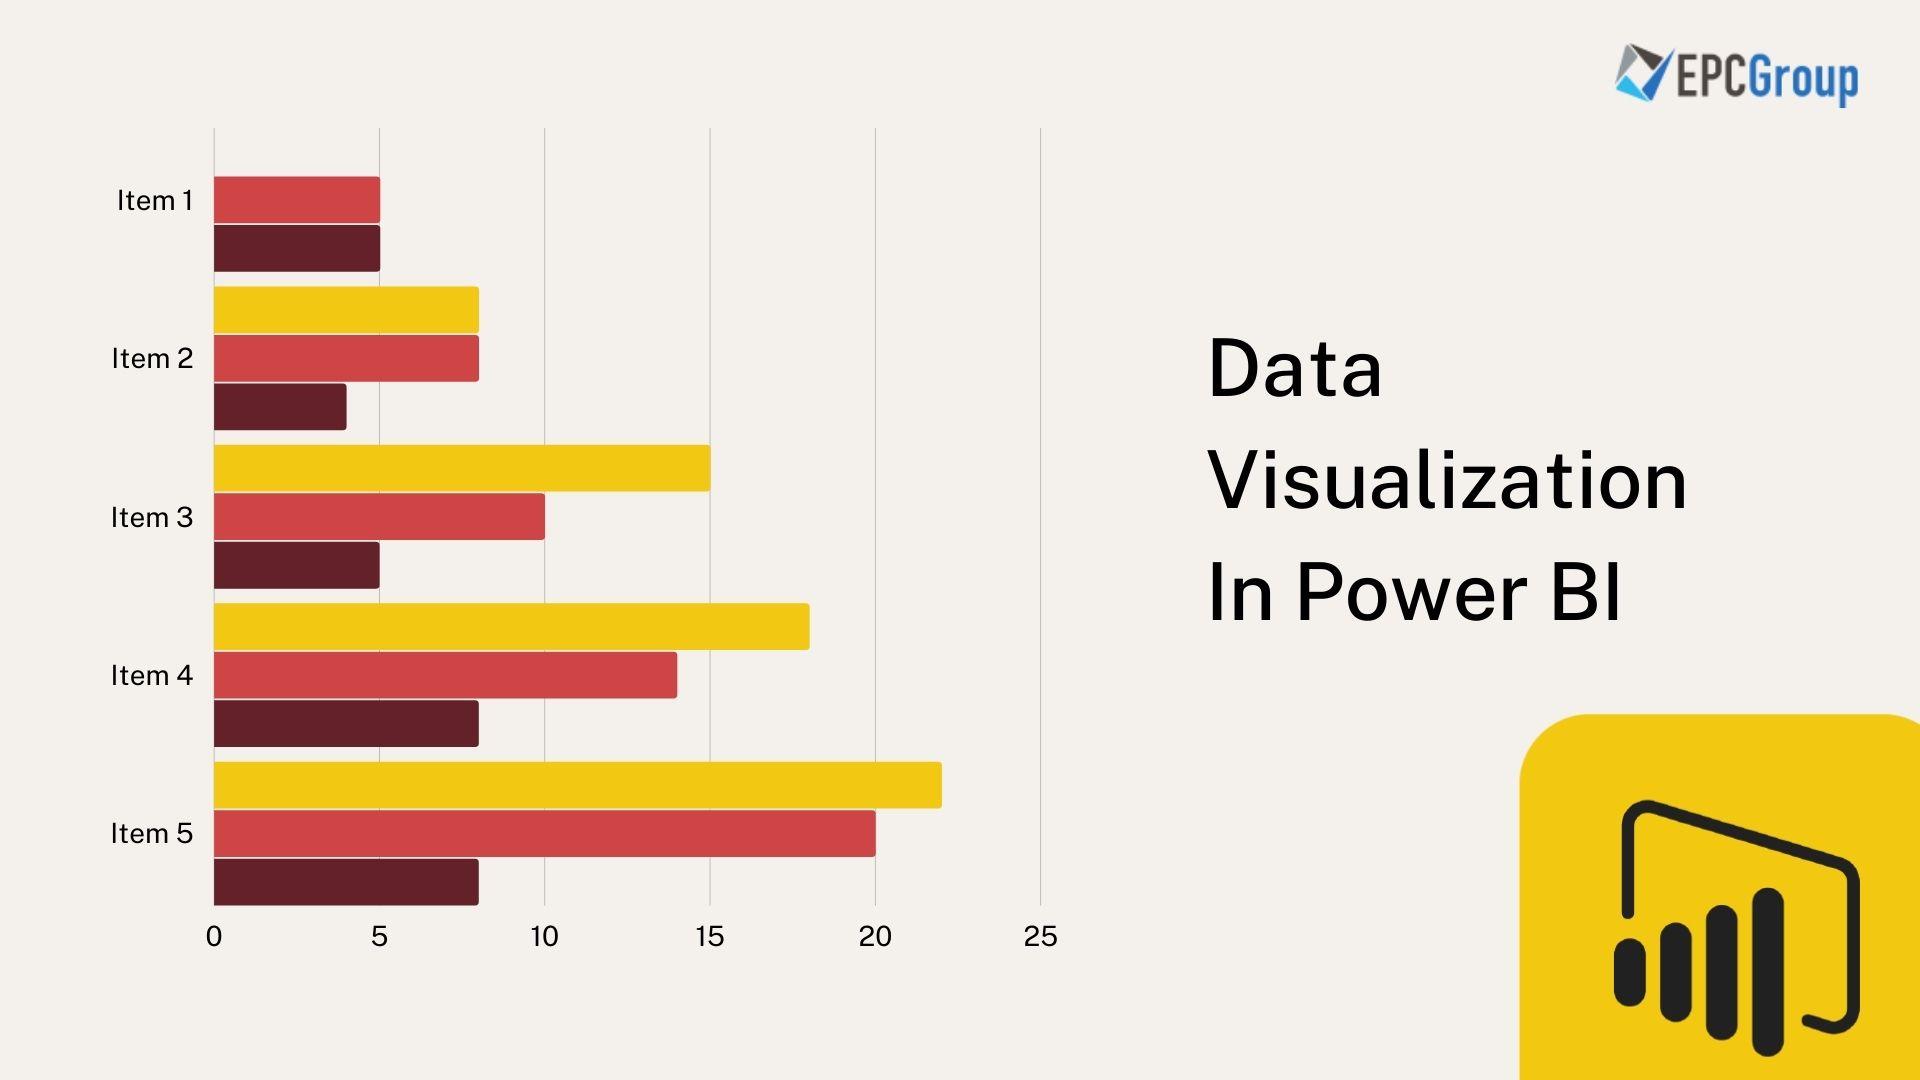 Data Visualization In Power BI: Interactive BI Reports - thumb image